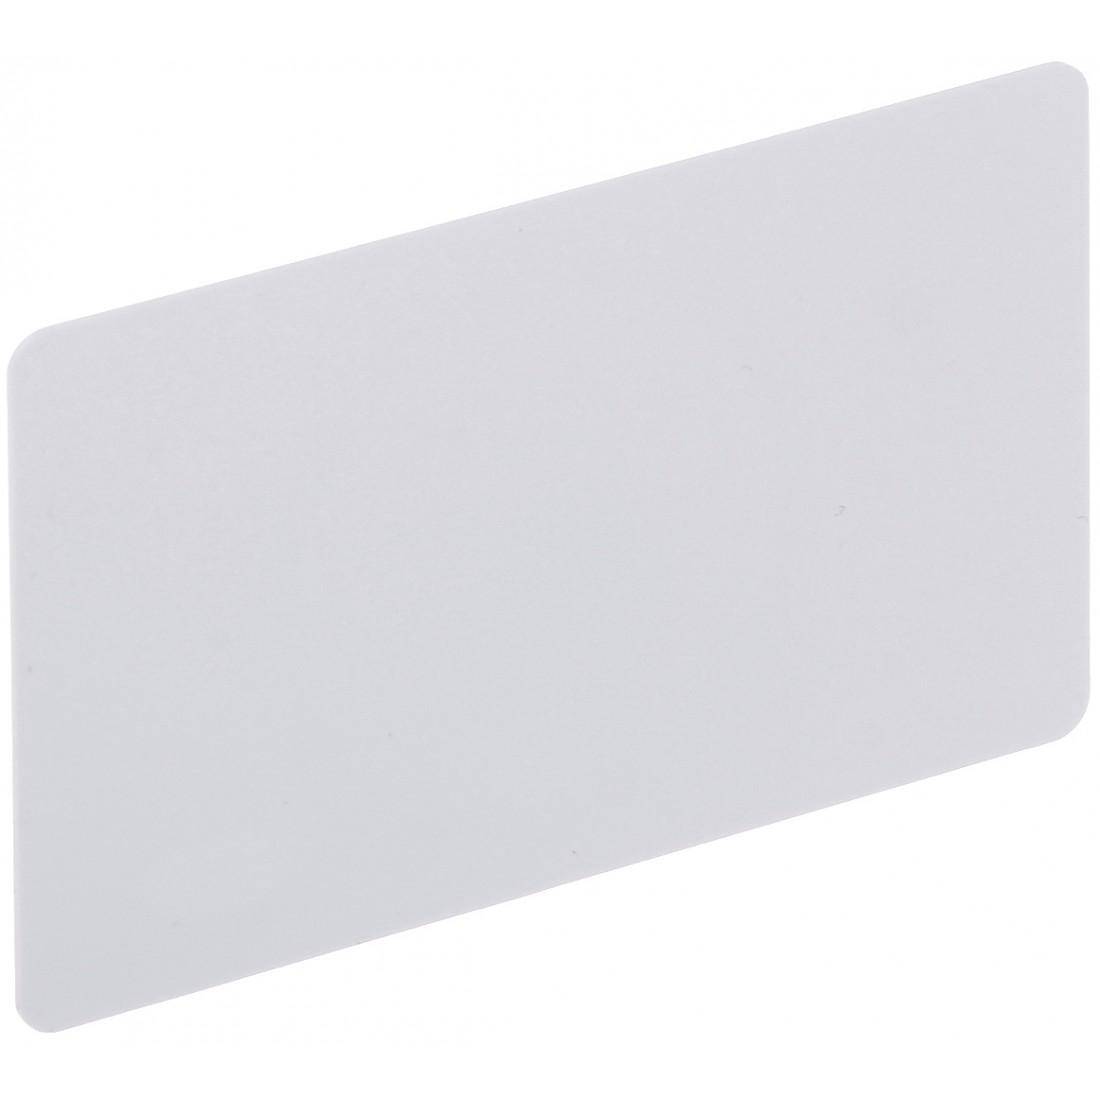 BEZKONTAKTNÁ KARTA PVC ATLO-104